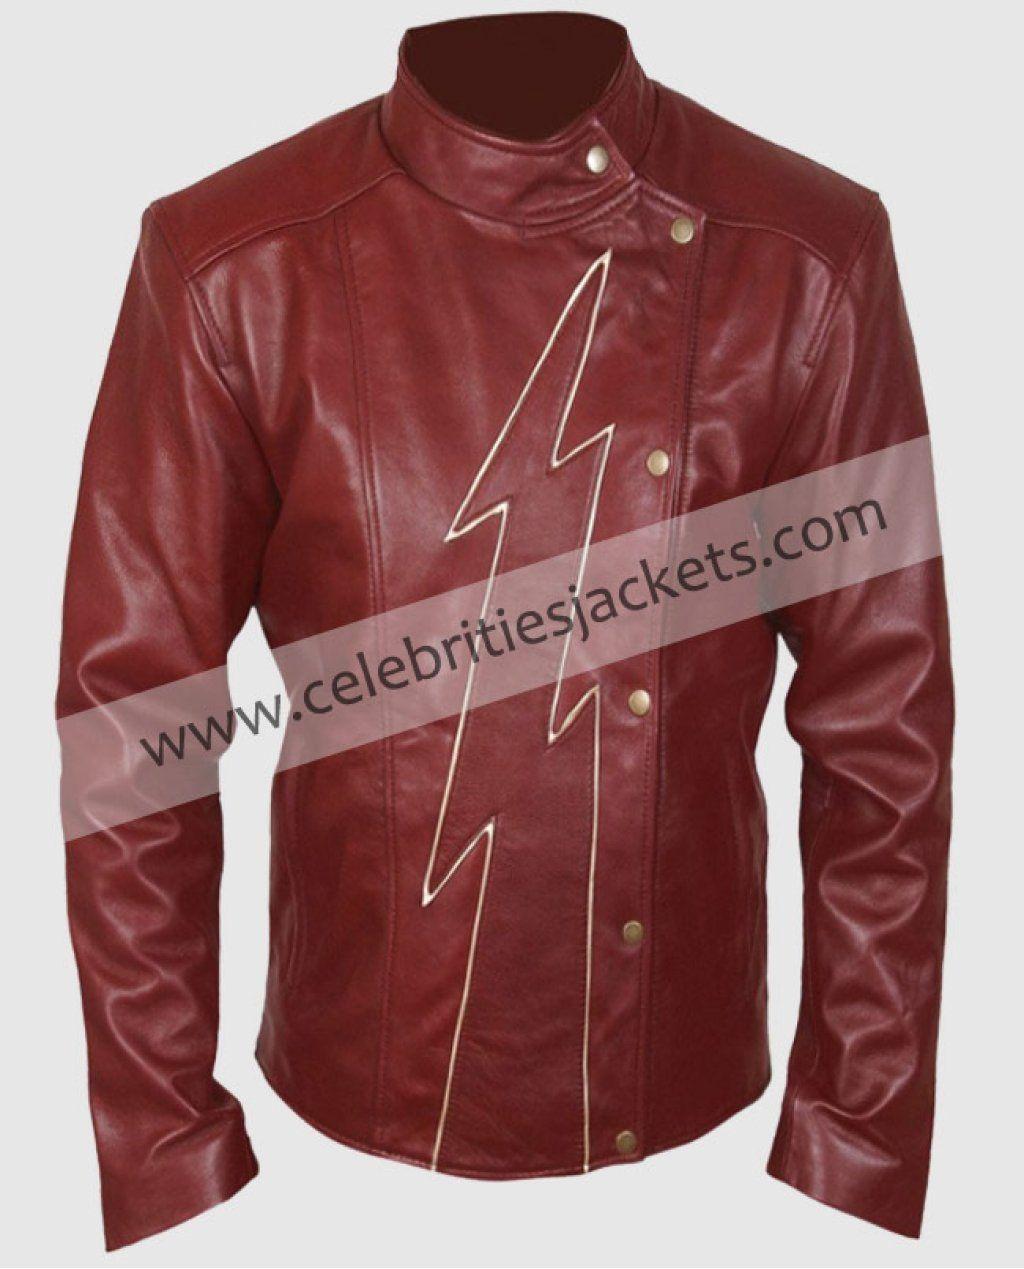 Flash Season 2 Jay Garrick Teddy Sears Barry Allen Maroon Jacket